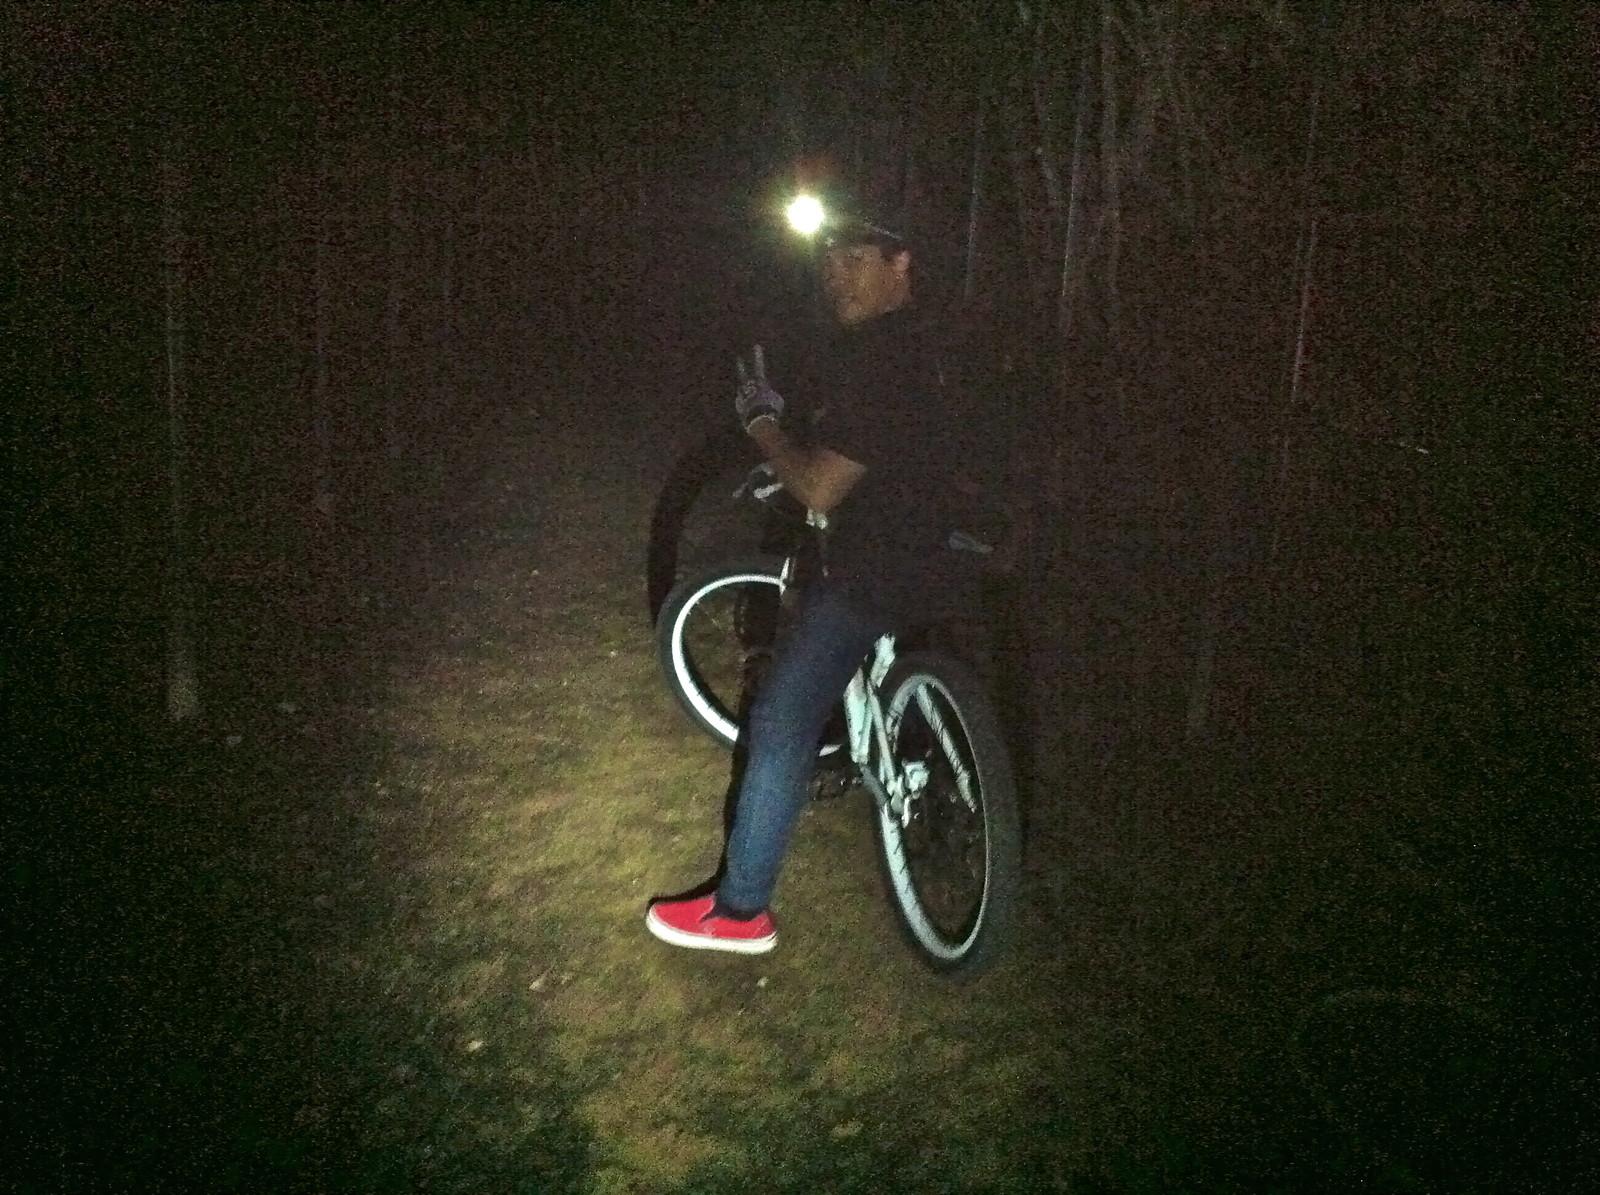 IMG 0665 - ragaboi - Mountain Biking Pictures - Vital MTB